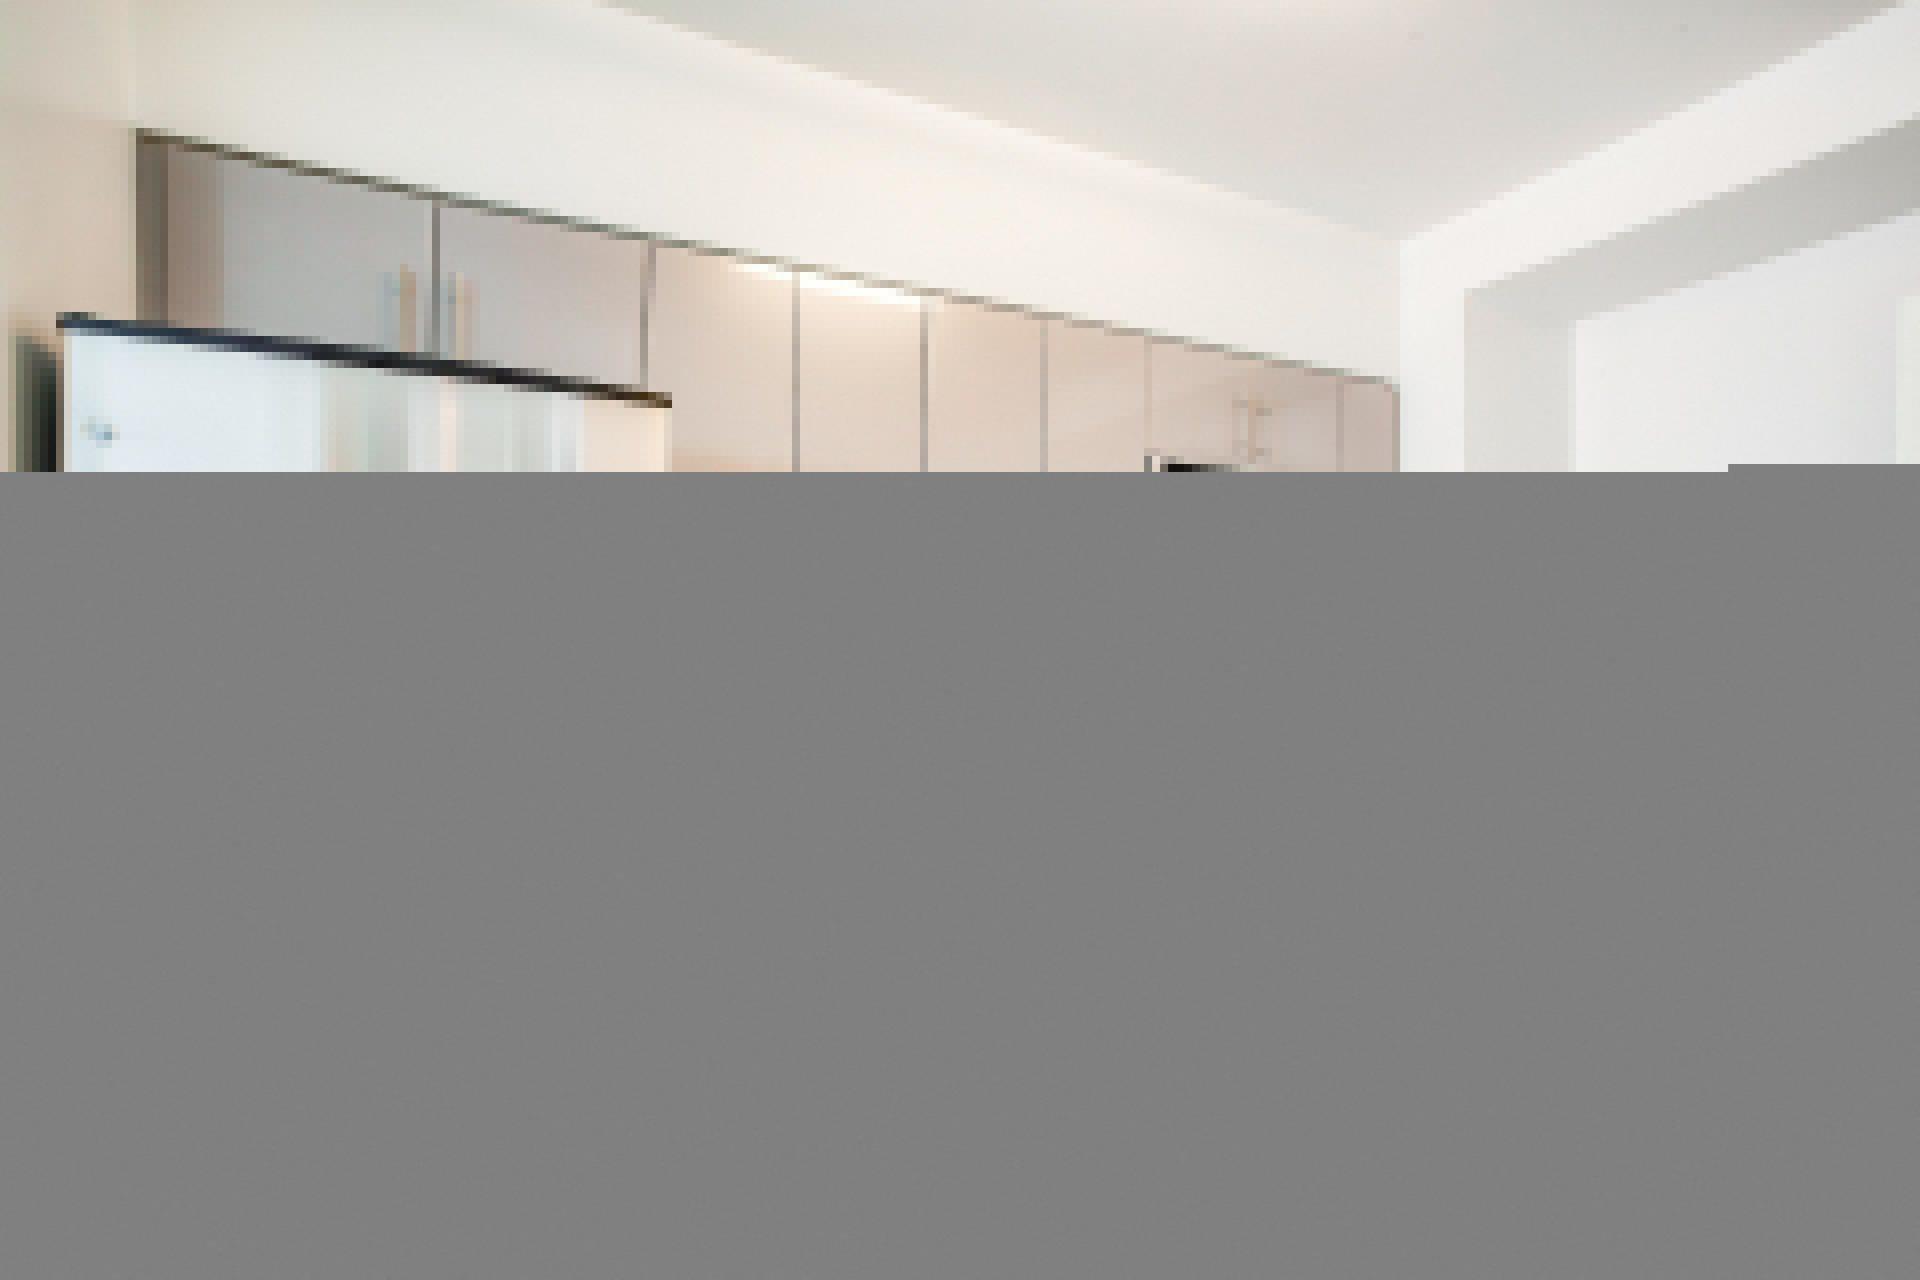 Tiled Kitchen Backsplash at Waterside Place by Windsor, Massachusetts, 02210